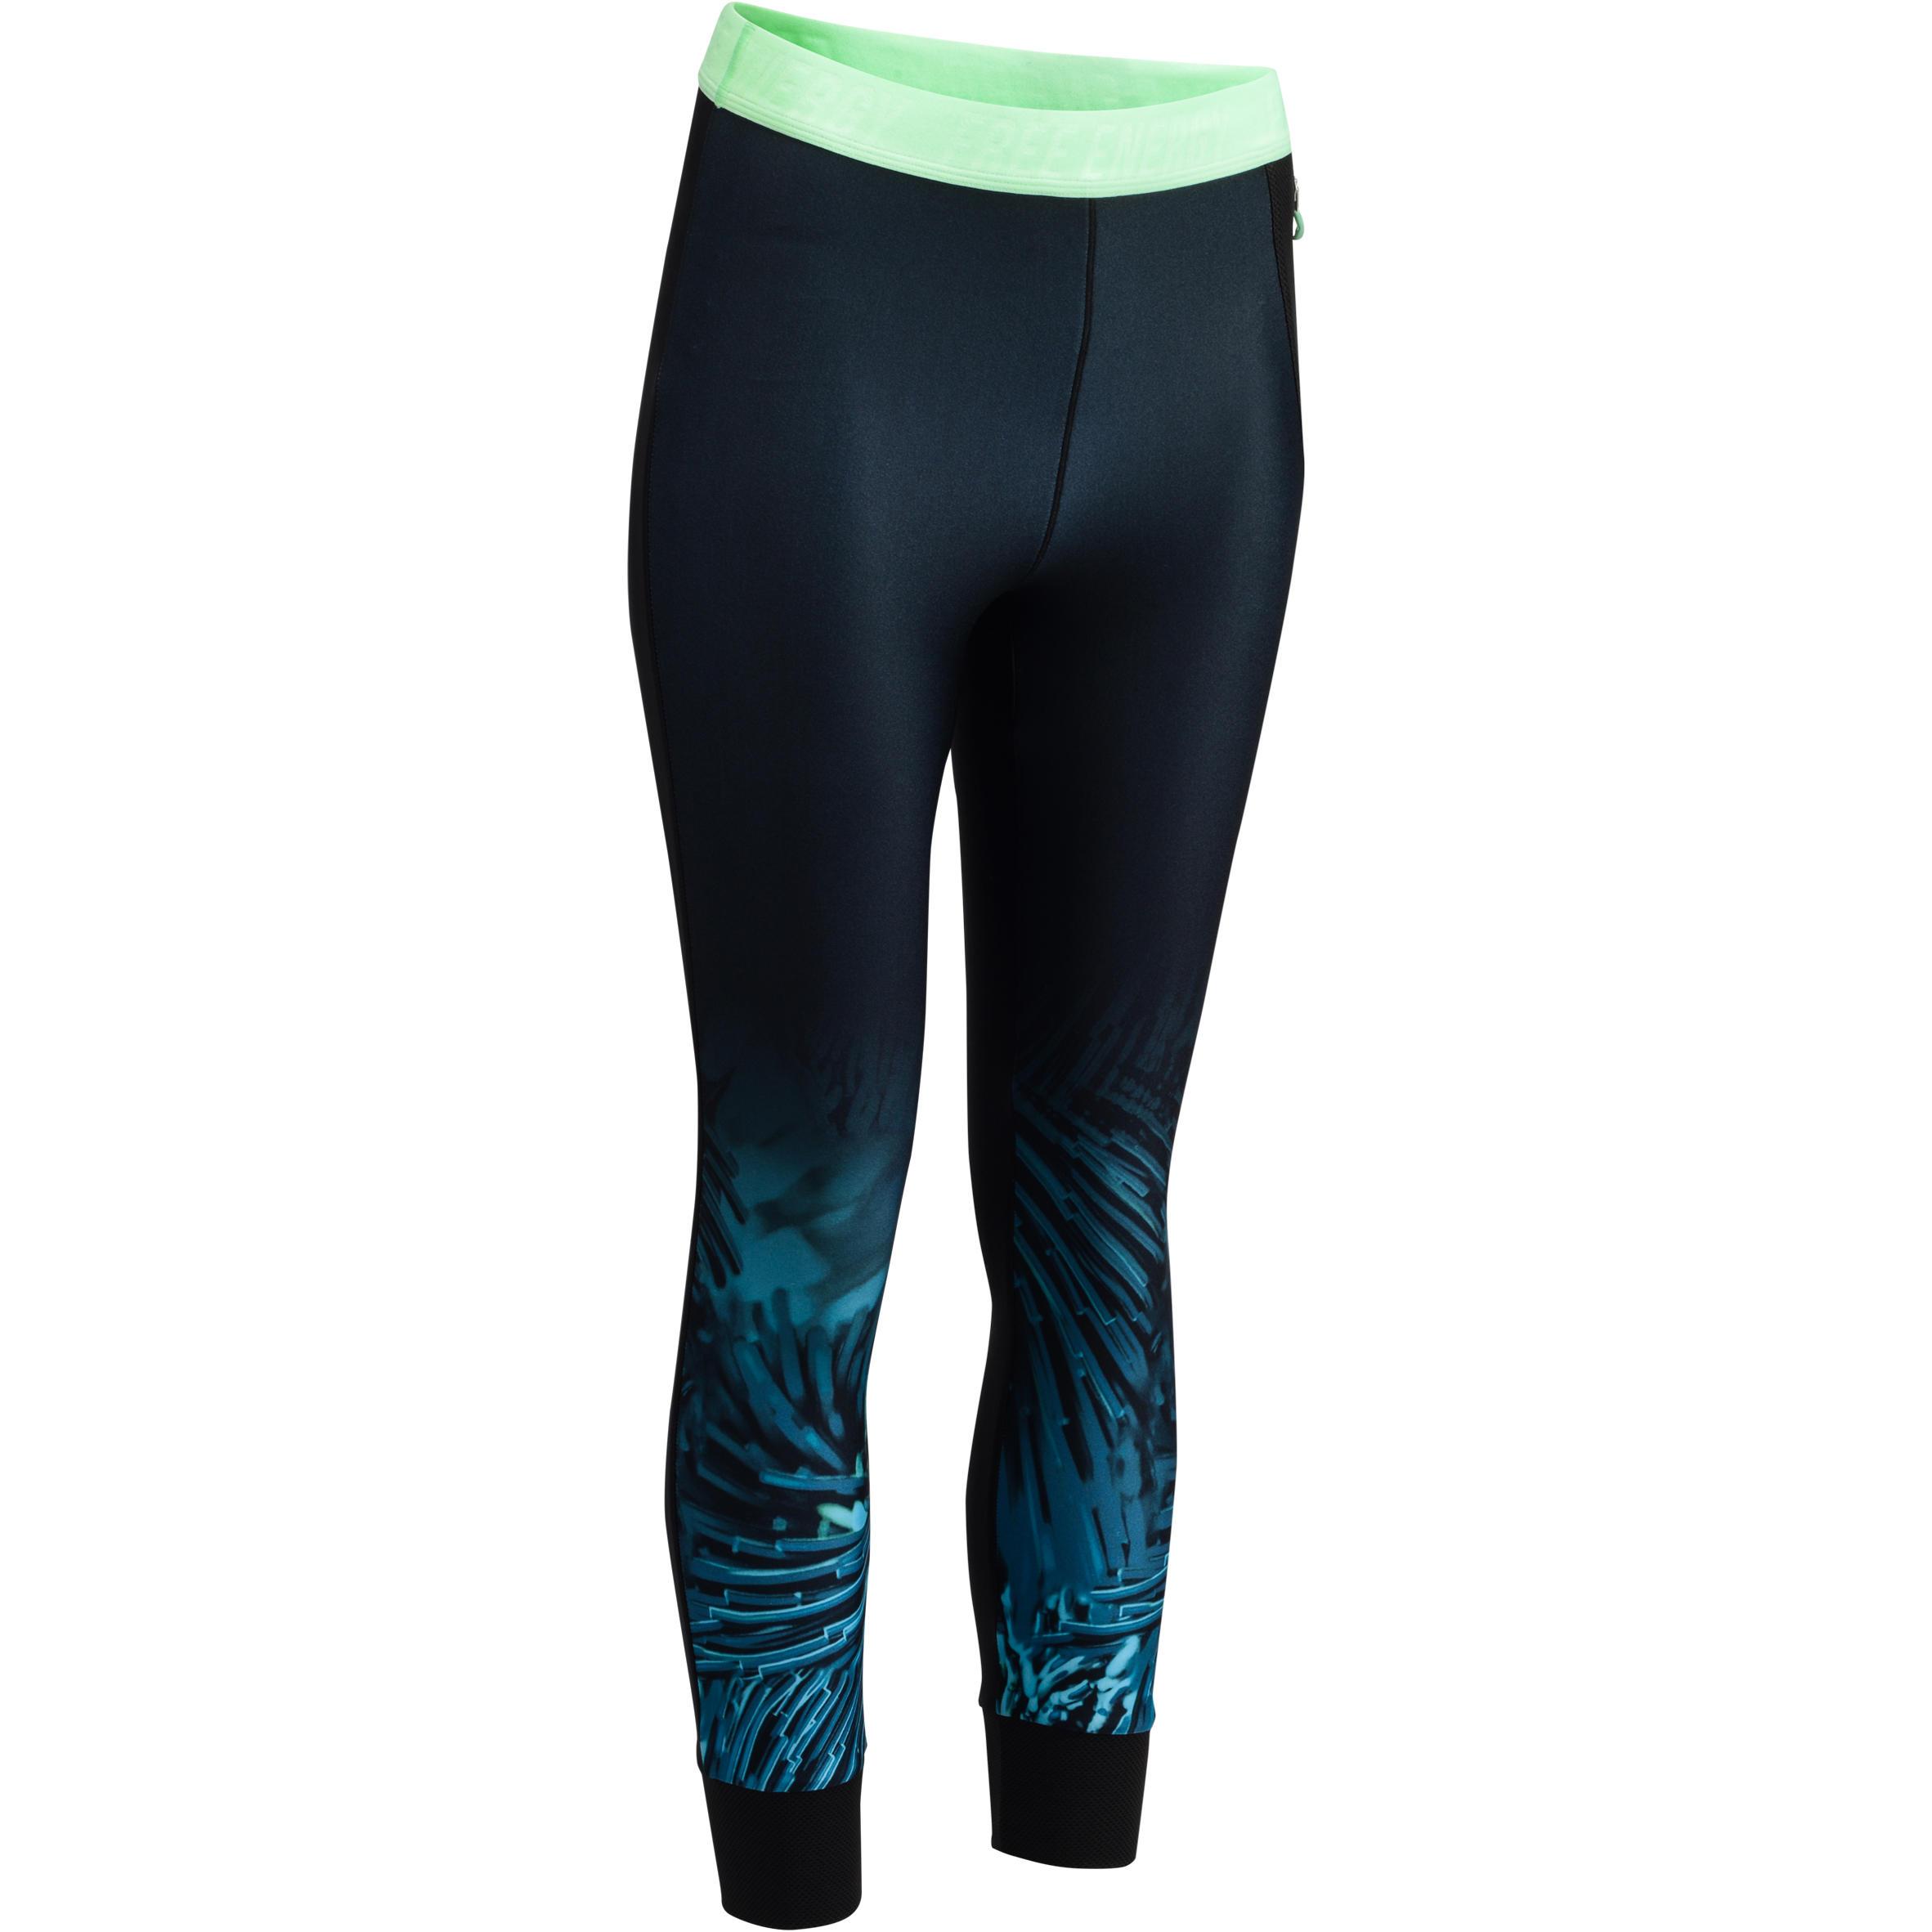 Domyos 7/8-legging 500 cardiofitness dames marineblauw met tropical details Domyos